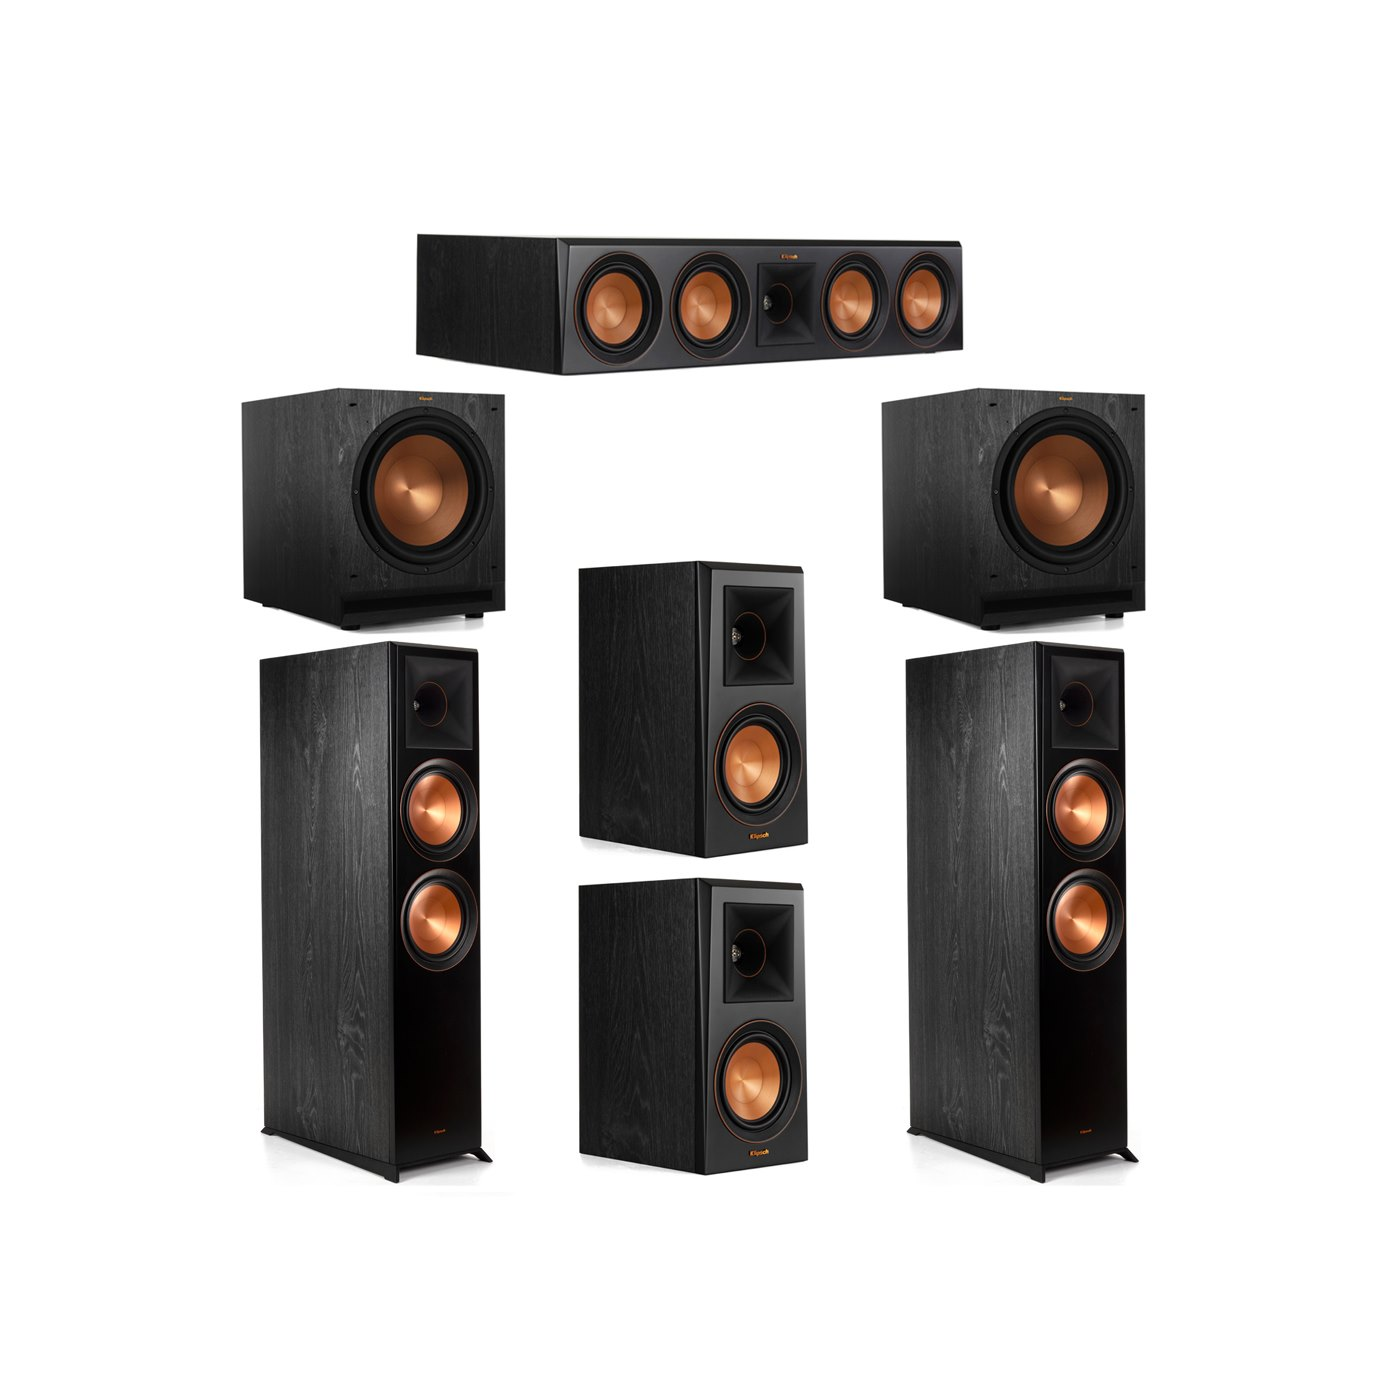 Klipsch 5.2 System with 2 RP-8000F Floorstanding Speakers, 1 Klipsch RP-504C Center Speaker, 2 Klipsch RP-500M Surround Speakers, 2 Klipsch SPL-120 Subwoofers